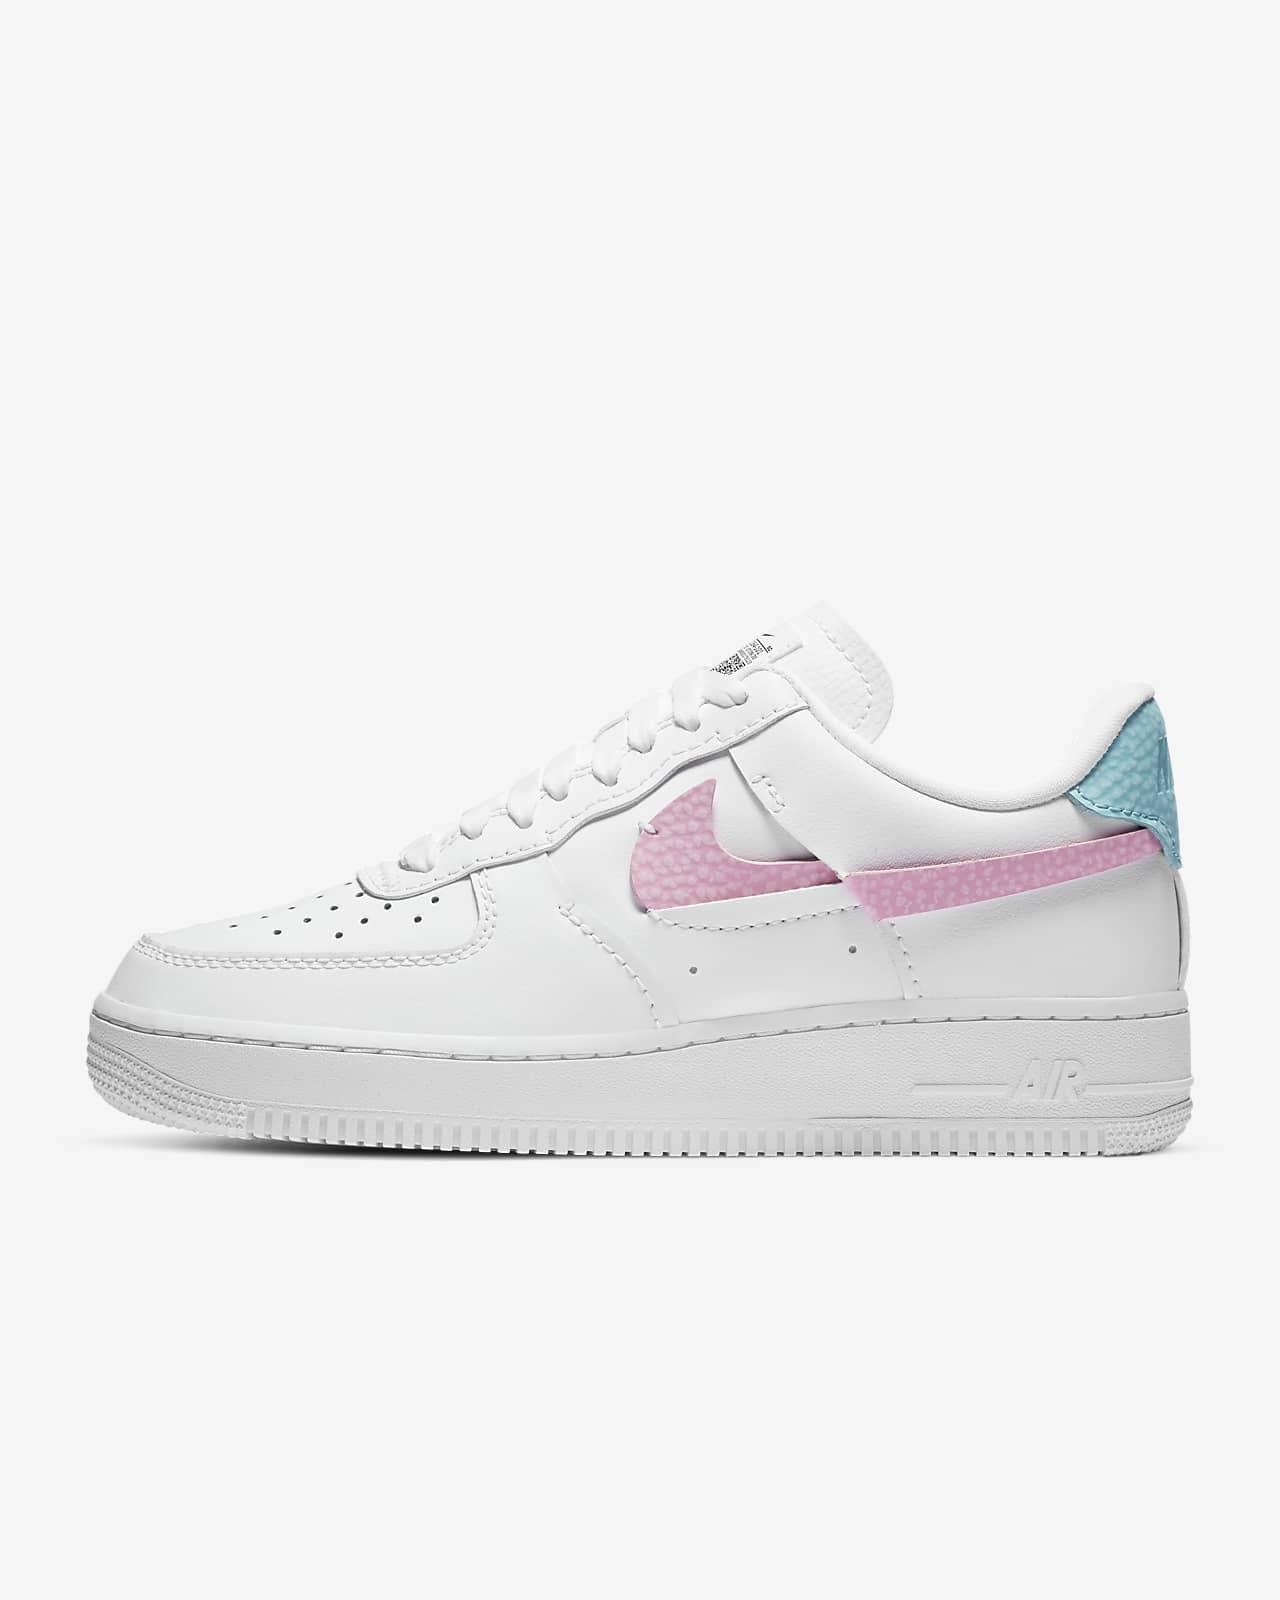 chaussure nike air force 1 femme